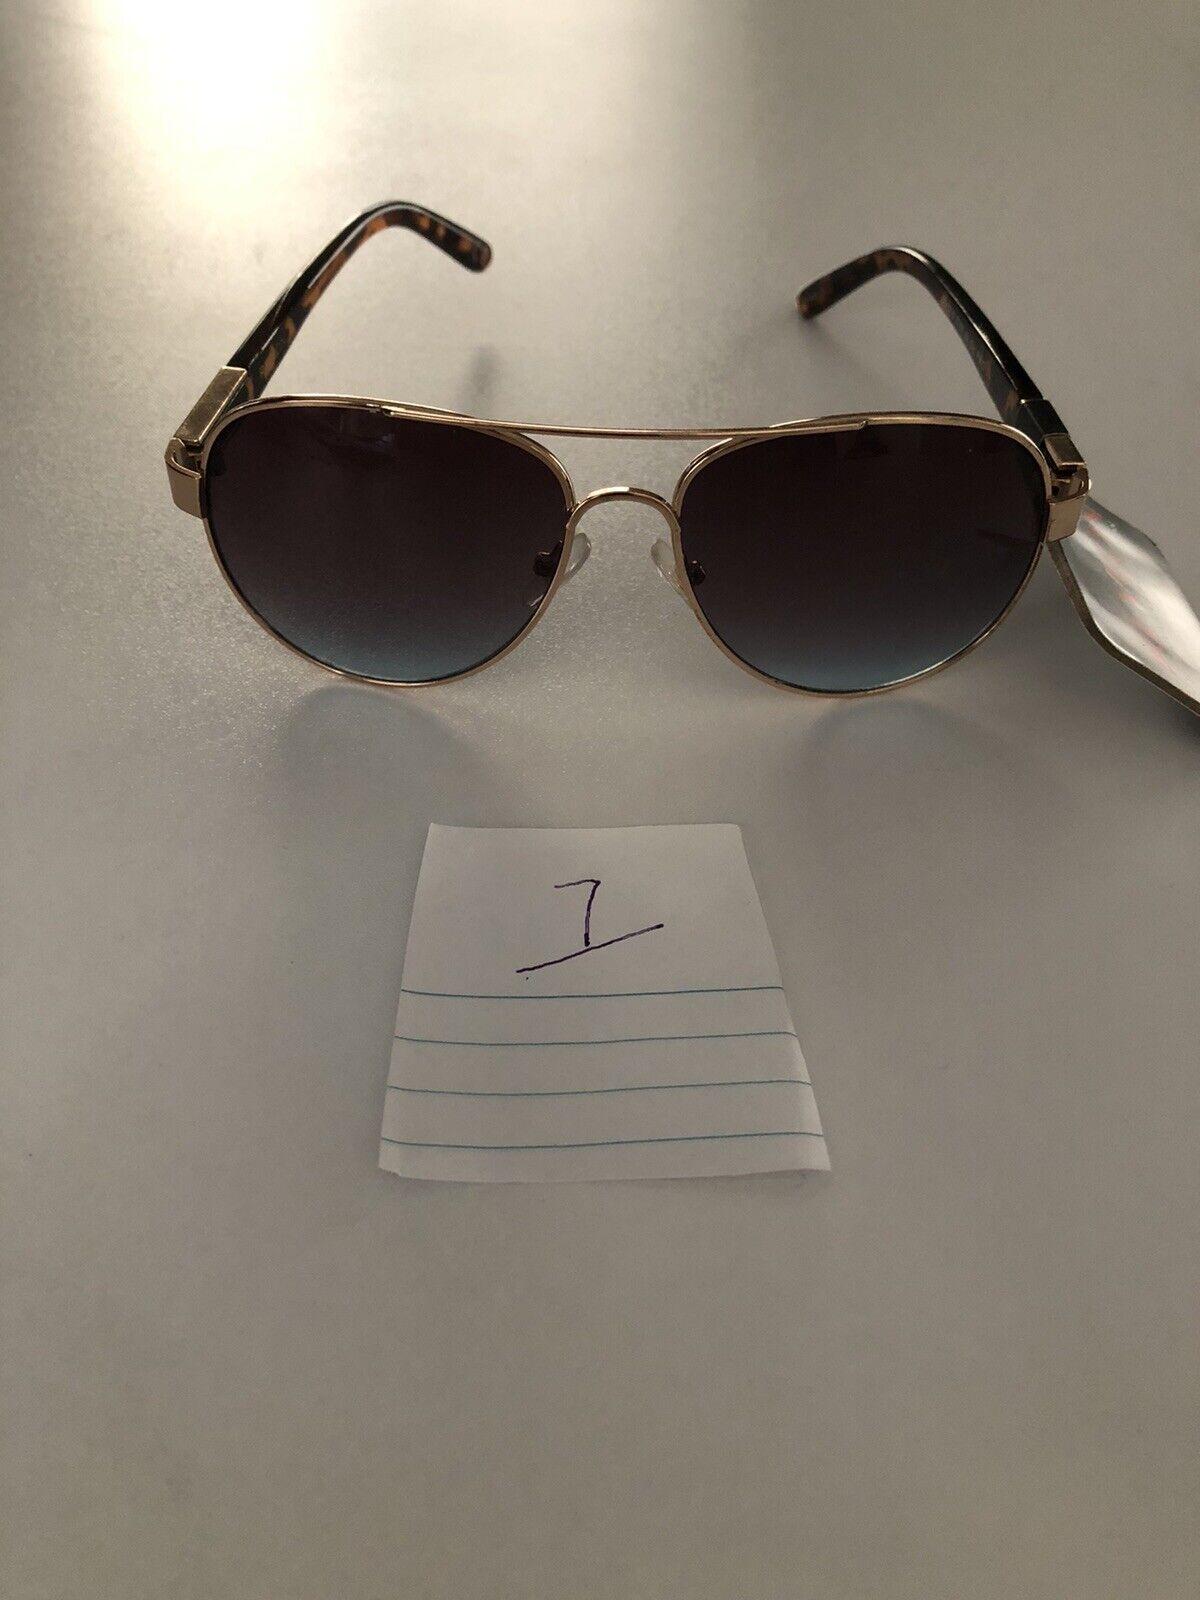 0887661302564 Women's Sunglasses Revlon Aviator Style 100% UVA/ UVB Protection.